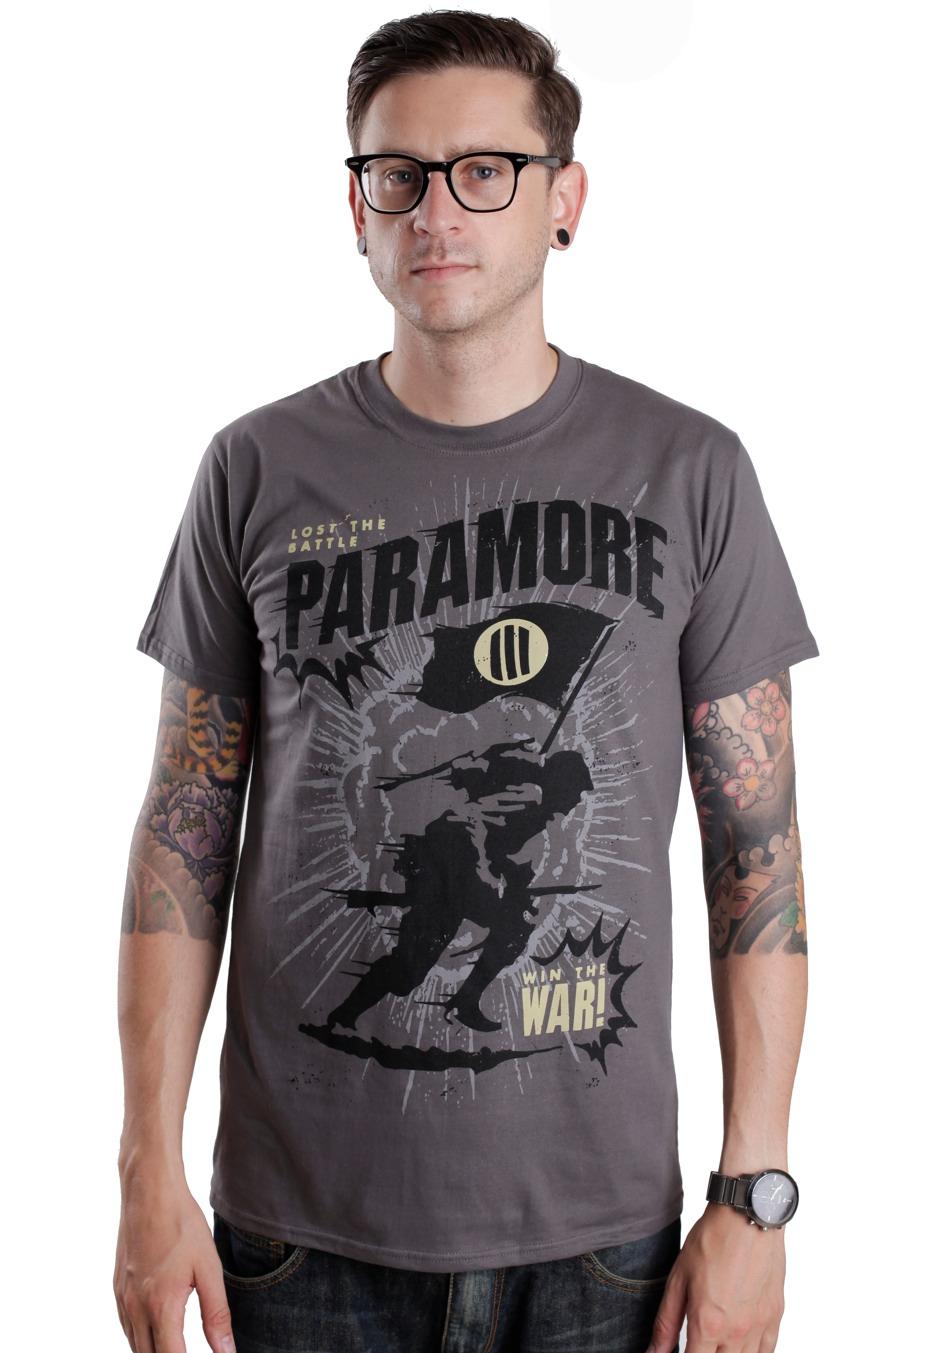 Paramore - Mindfield Grey - T-Shirt - Official Pop Punk ... Paramore Mersch Nederland